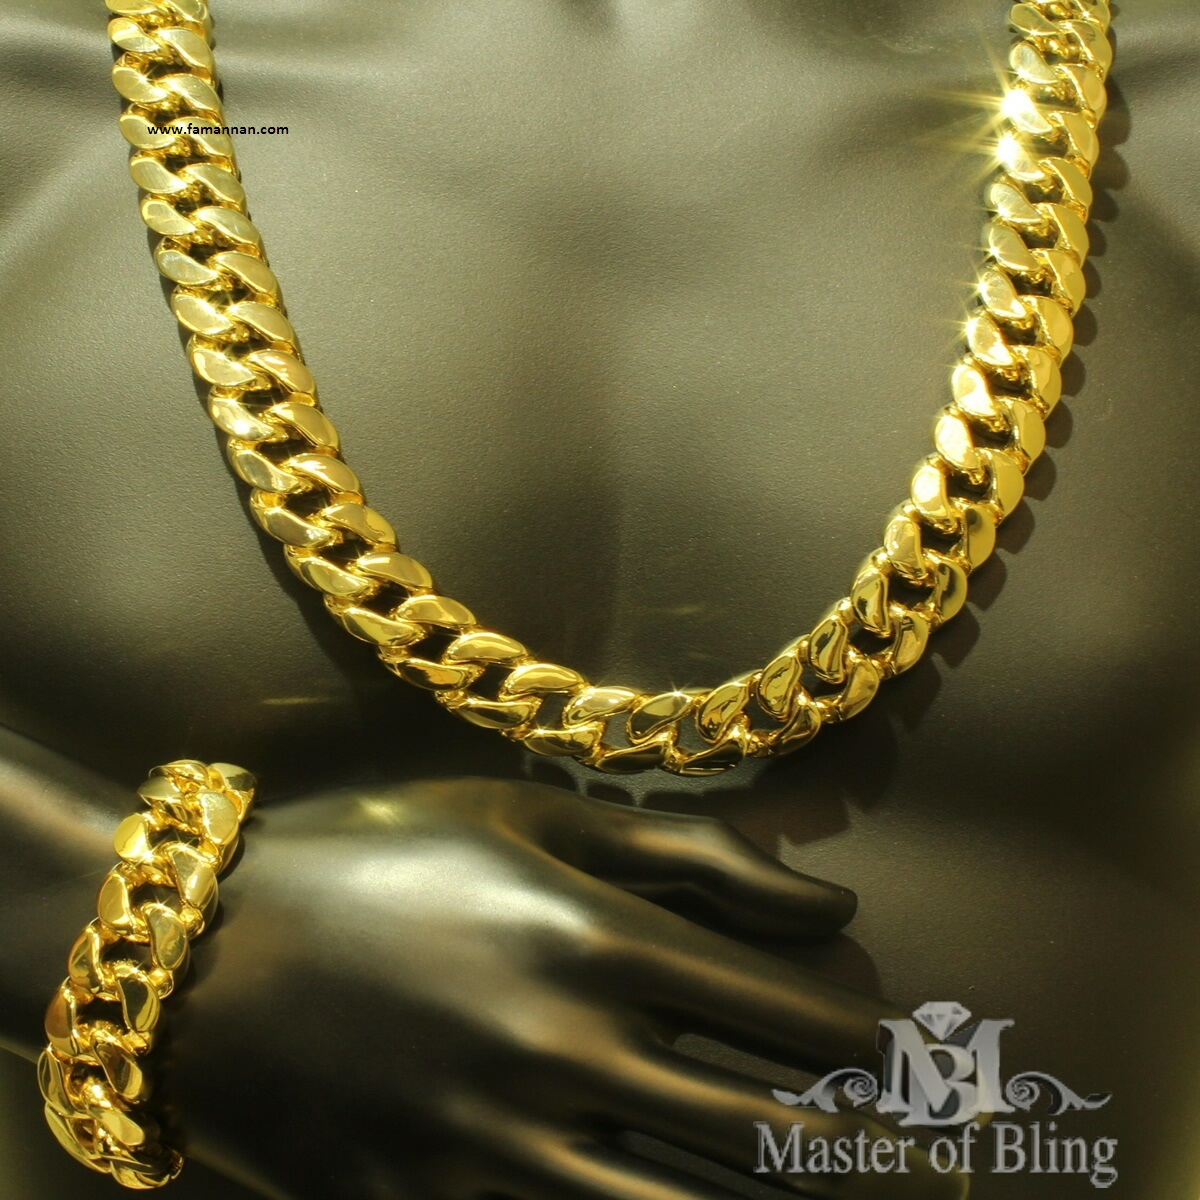 Ivory Coast New Men's Fashion Gold Jewellery Bracelet Locket Chain 1499